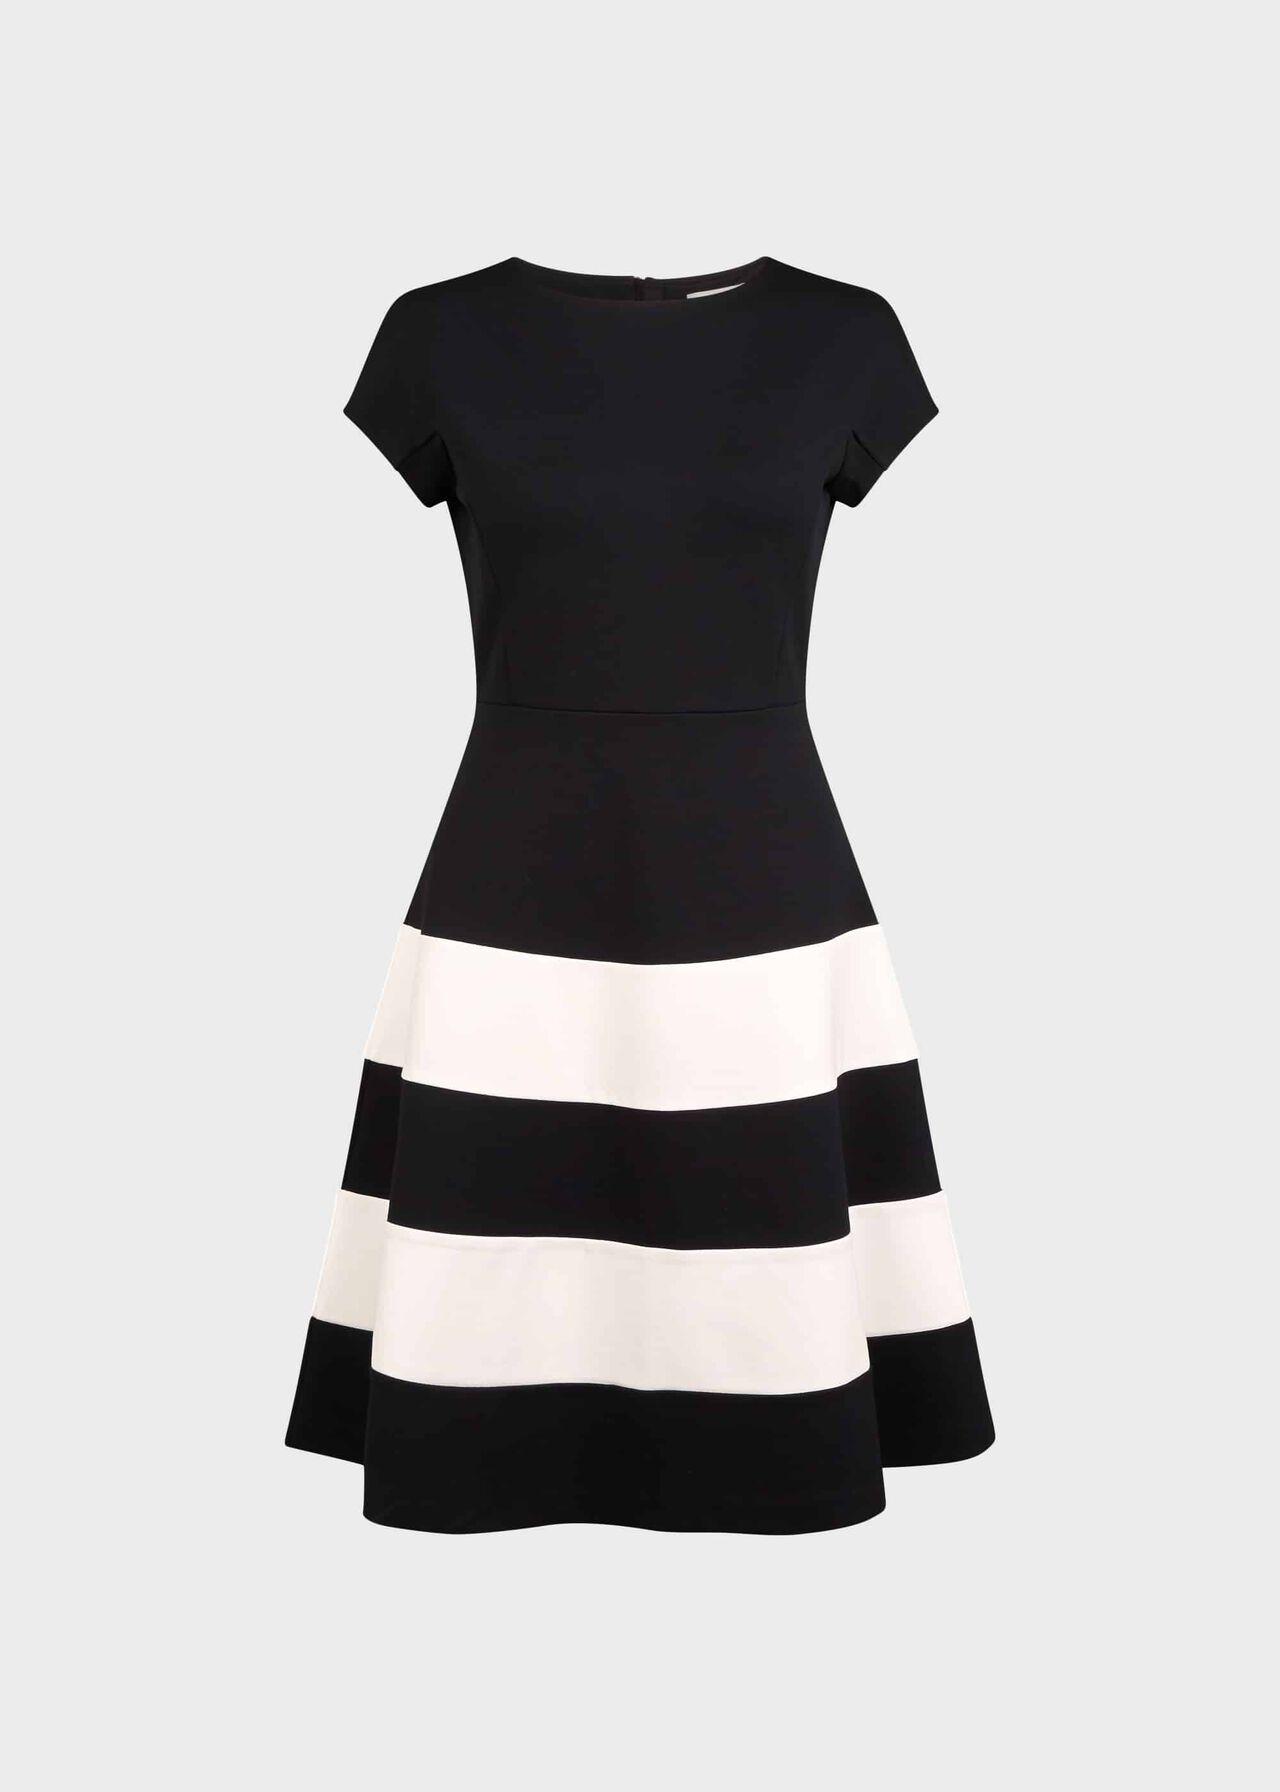 Lizzie Jersey Colourblock Dress Black Ivory